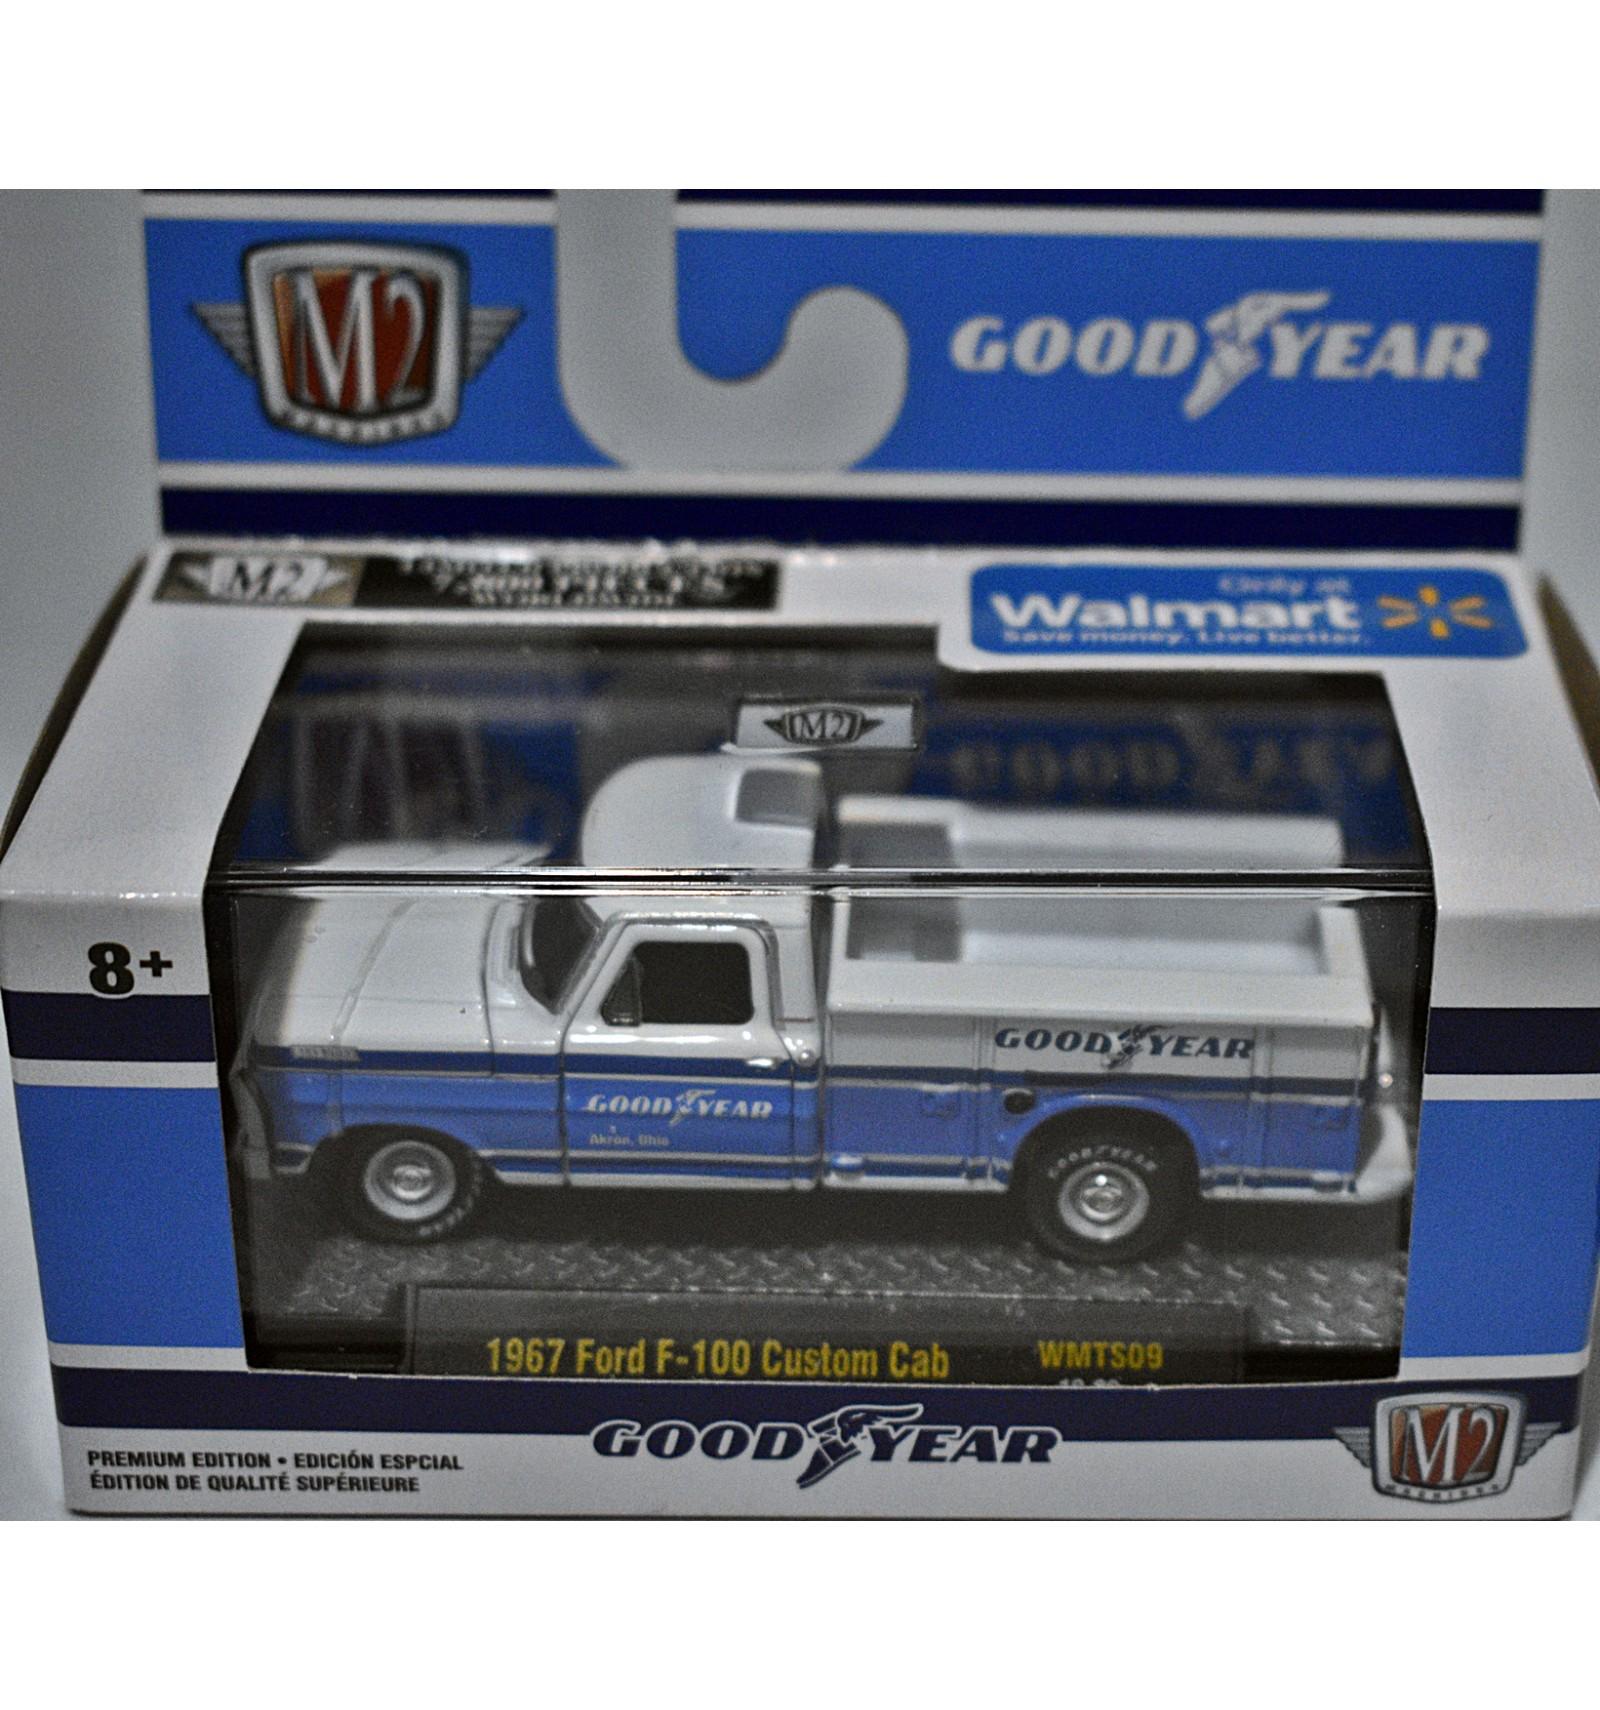 M2 Goodyear 1967 Ford F 100 Custom Cab Goodyear Service Truck Global Diecast Direct